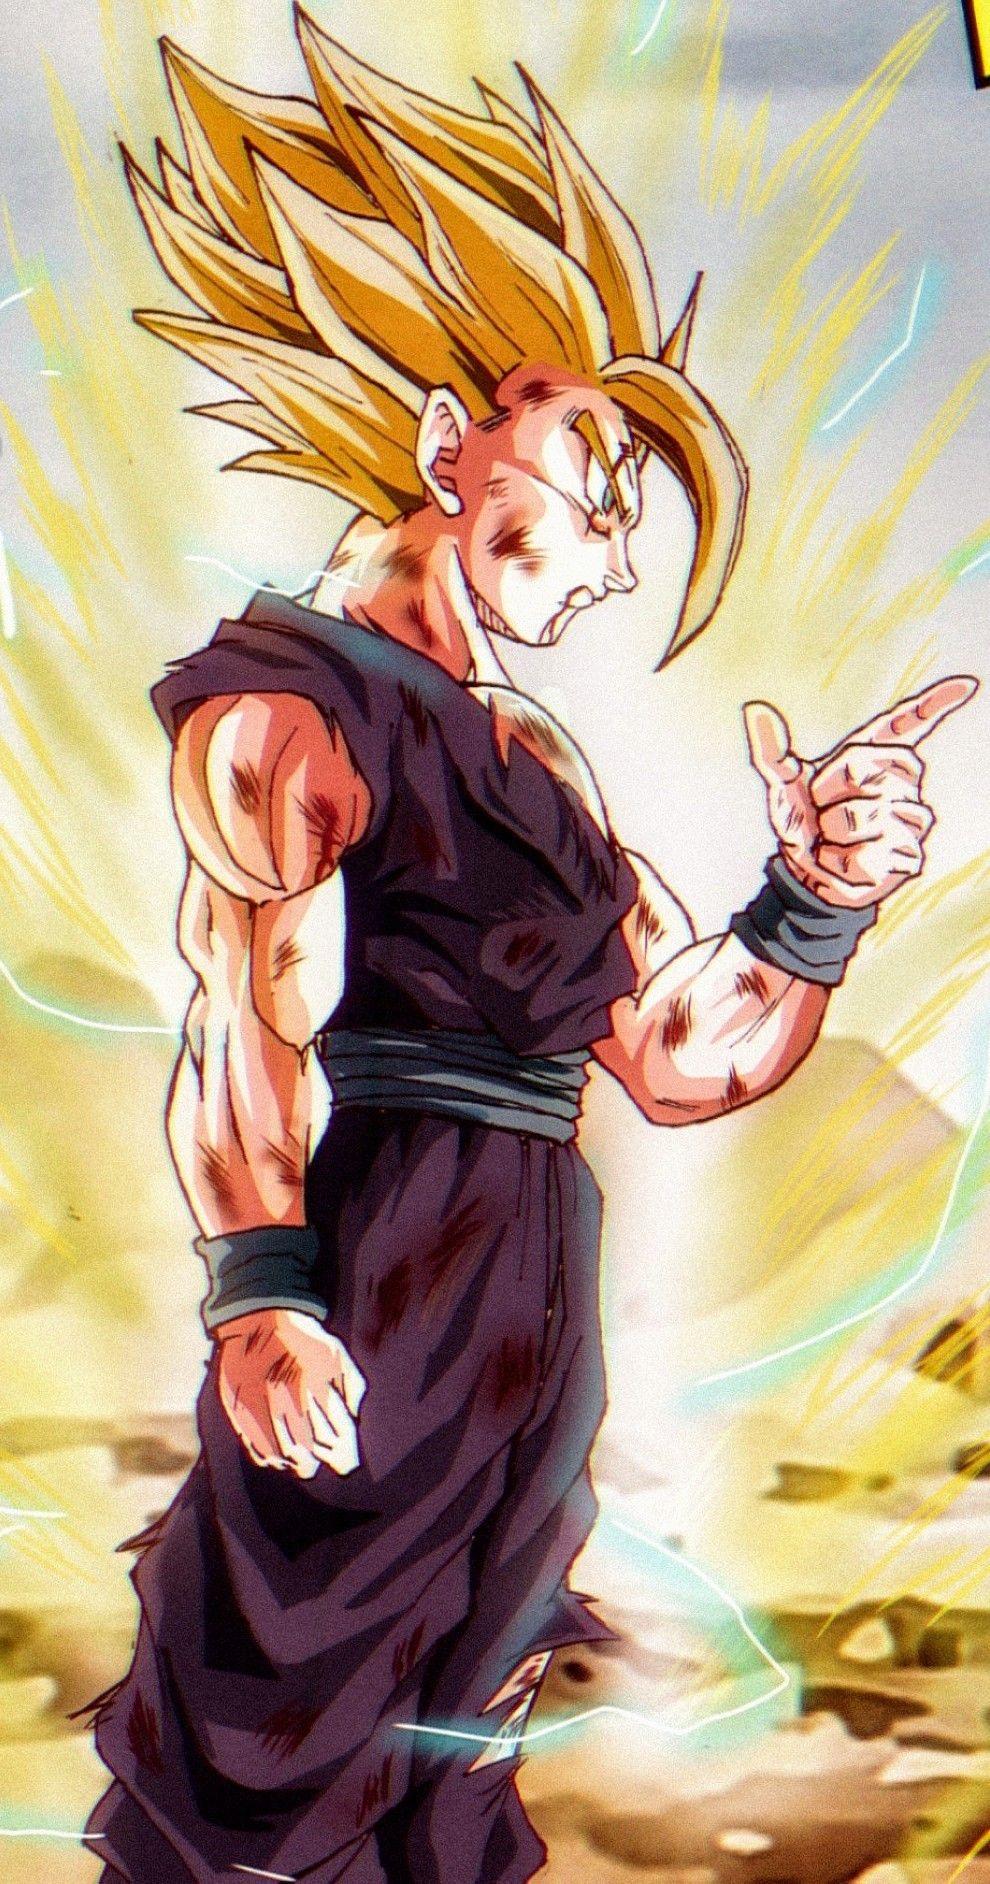 Gohan Super Saiyan 2 By Zamorabap Y Juliangutierrez02 Dragon Ball Super Dragon Ball Z Dragon Ball